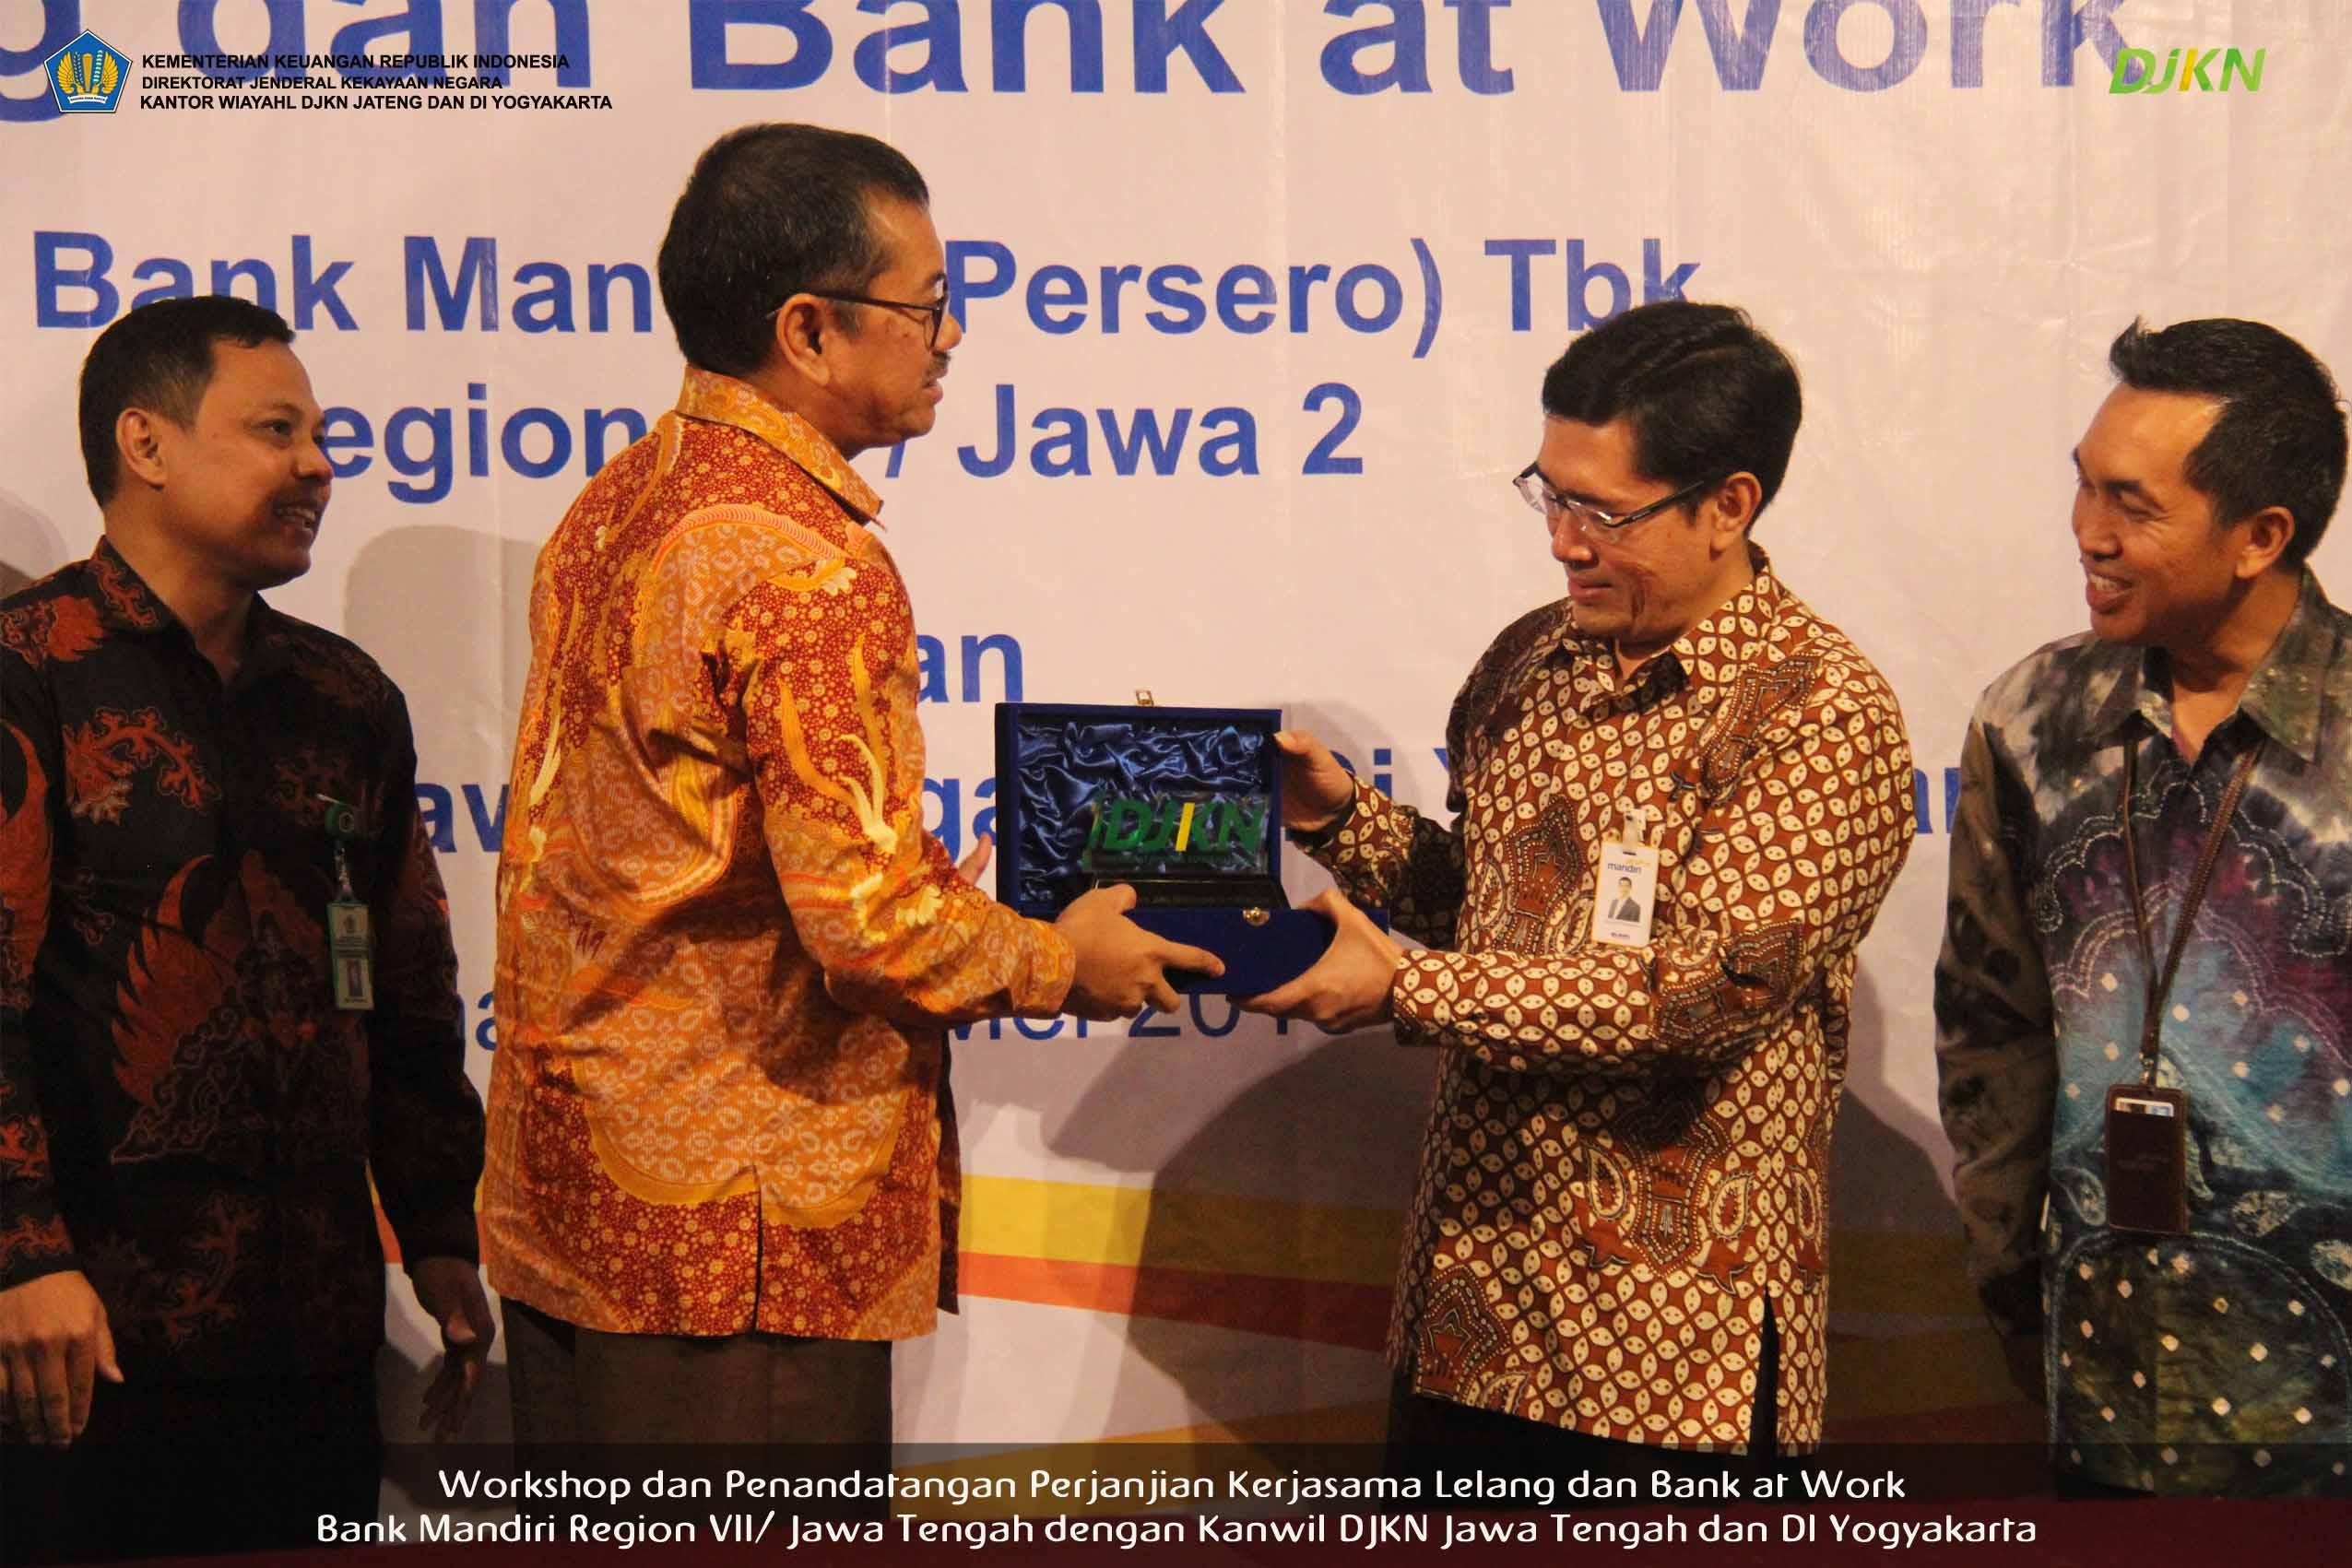 Kakanwil DJKN Jateng & DIY: Kerjasama Mandiri - DJKN Merupakan Trigger Elaborasi